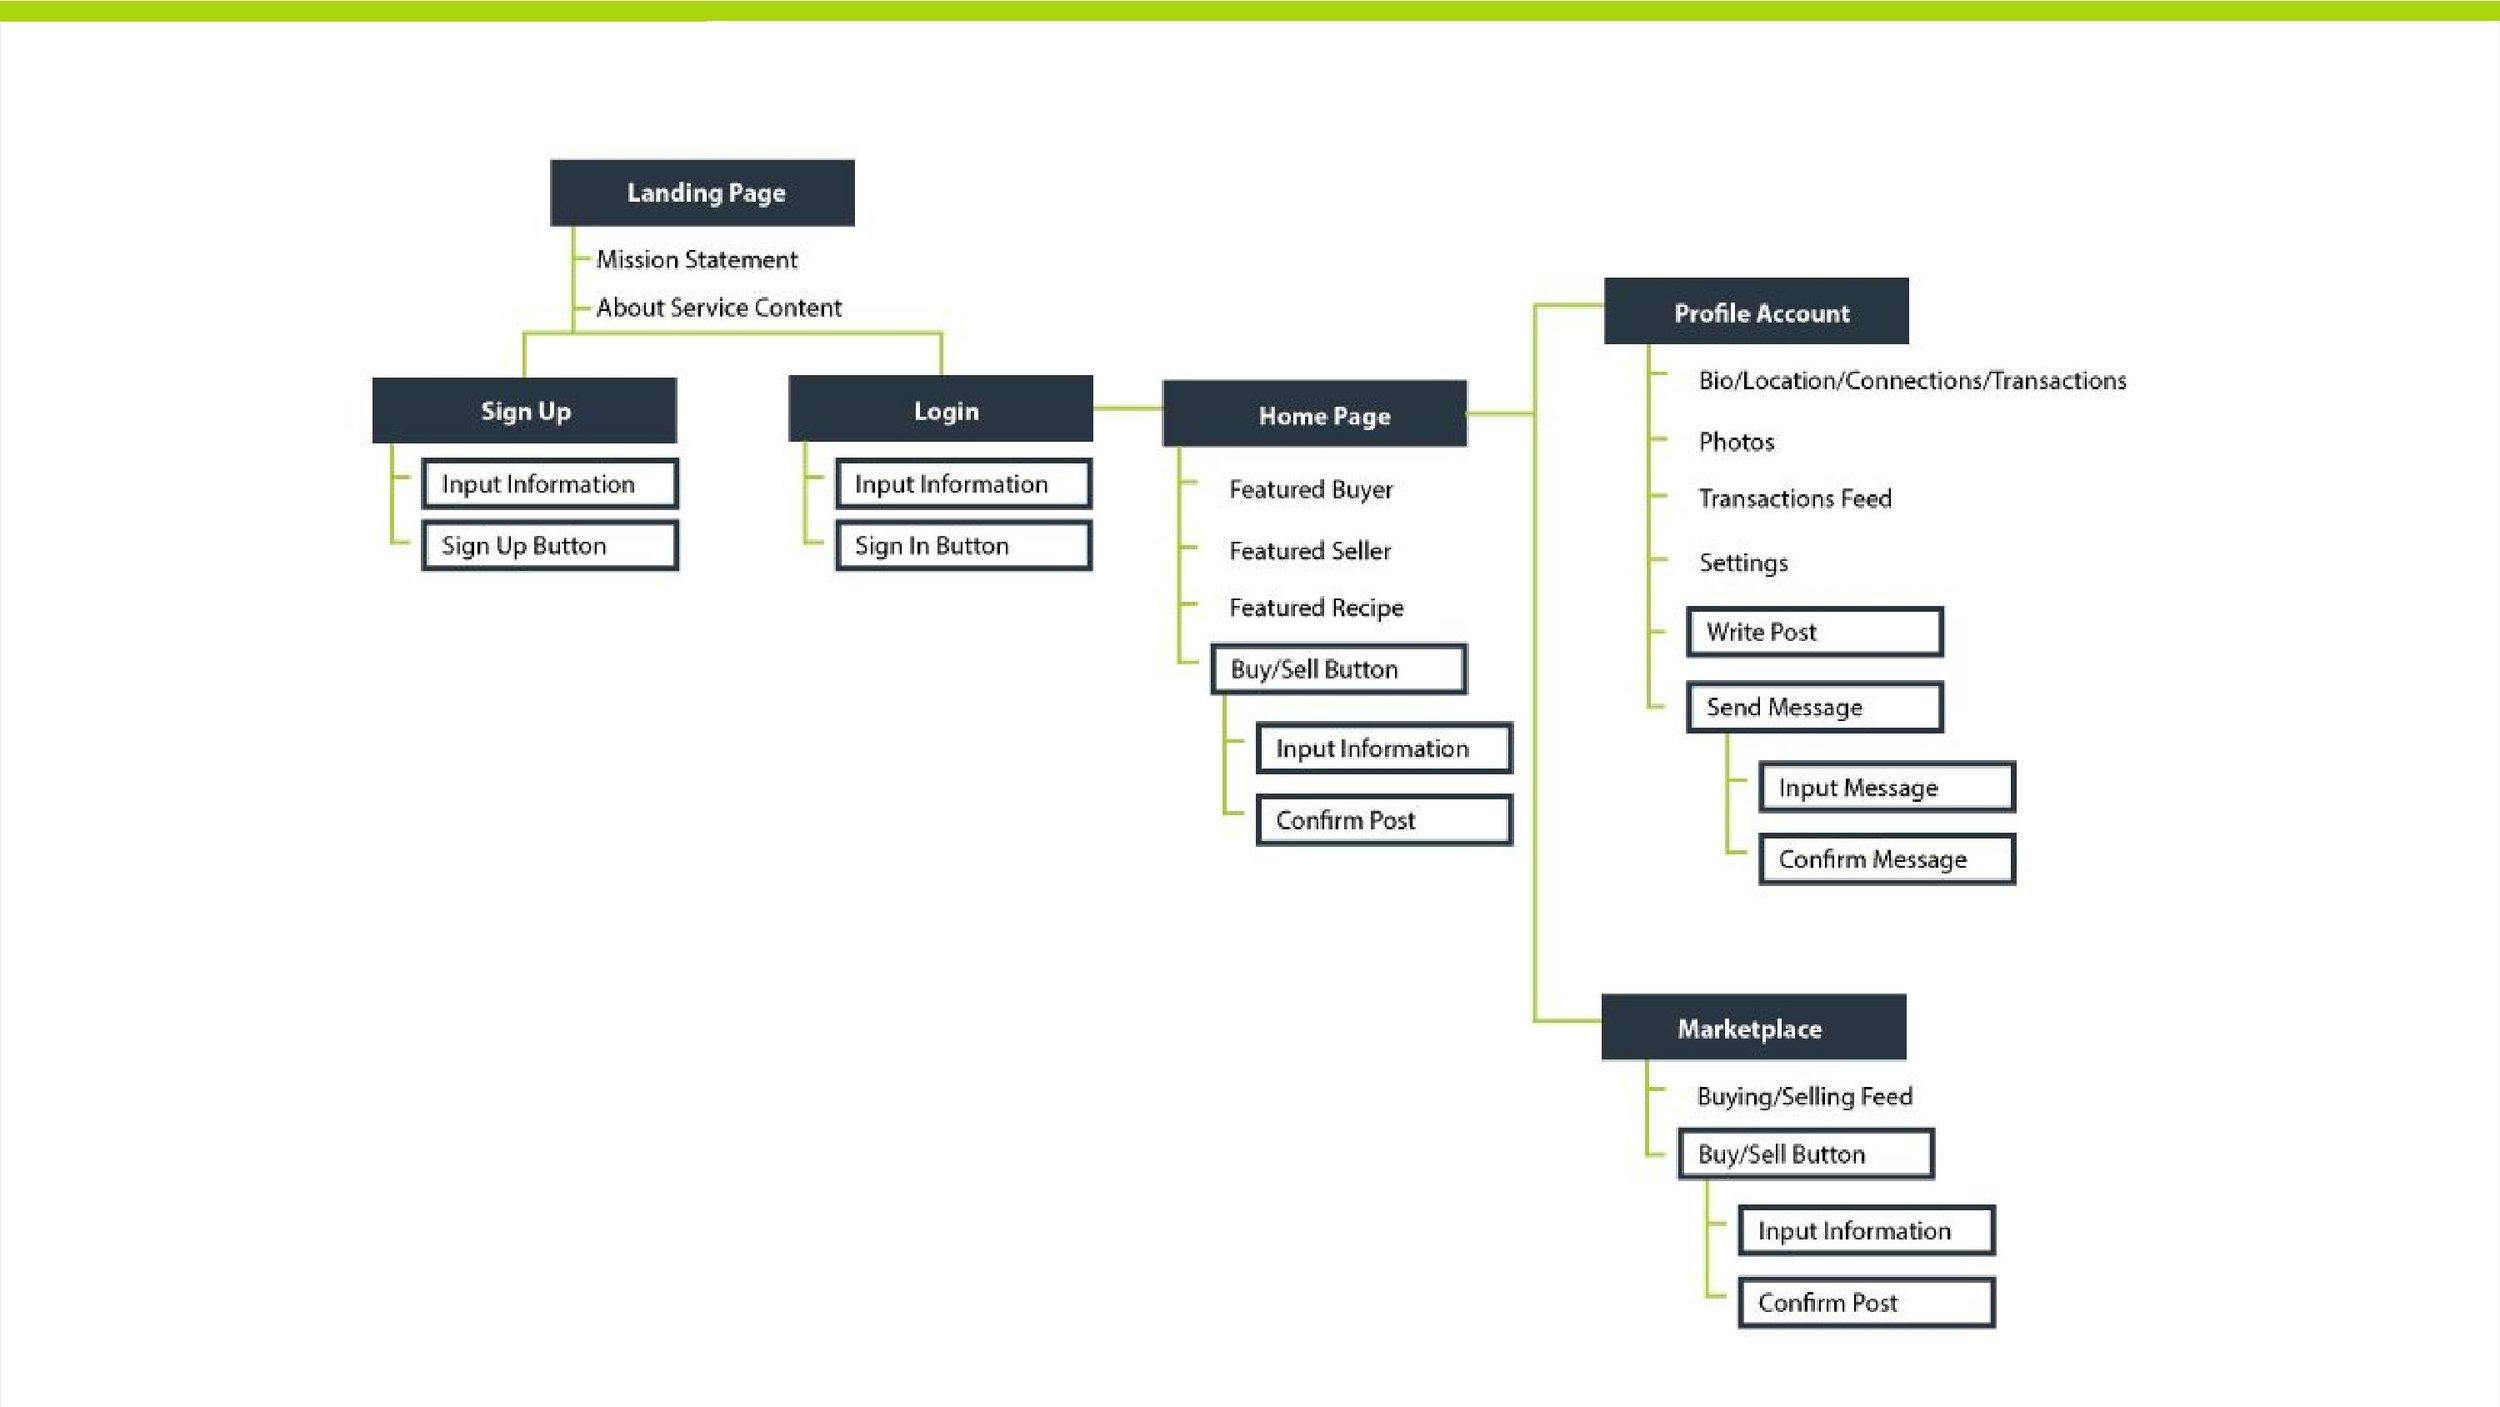 AdvUX_FinalPresentation-page-019.jpg